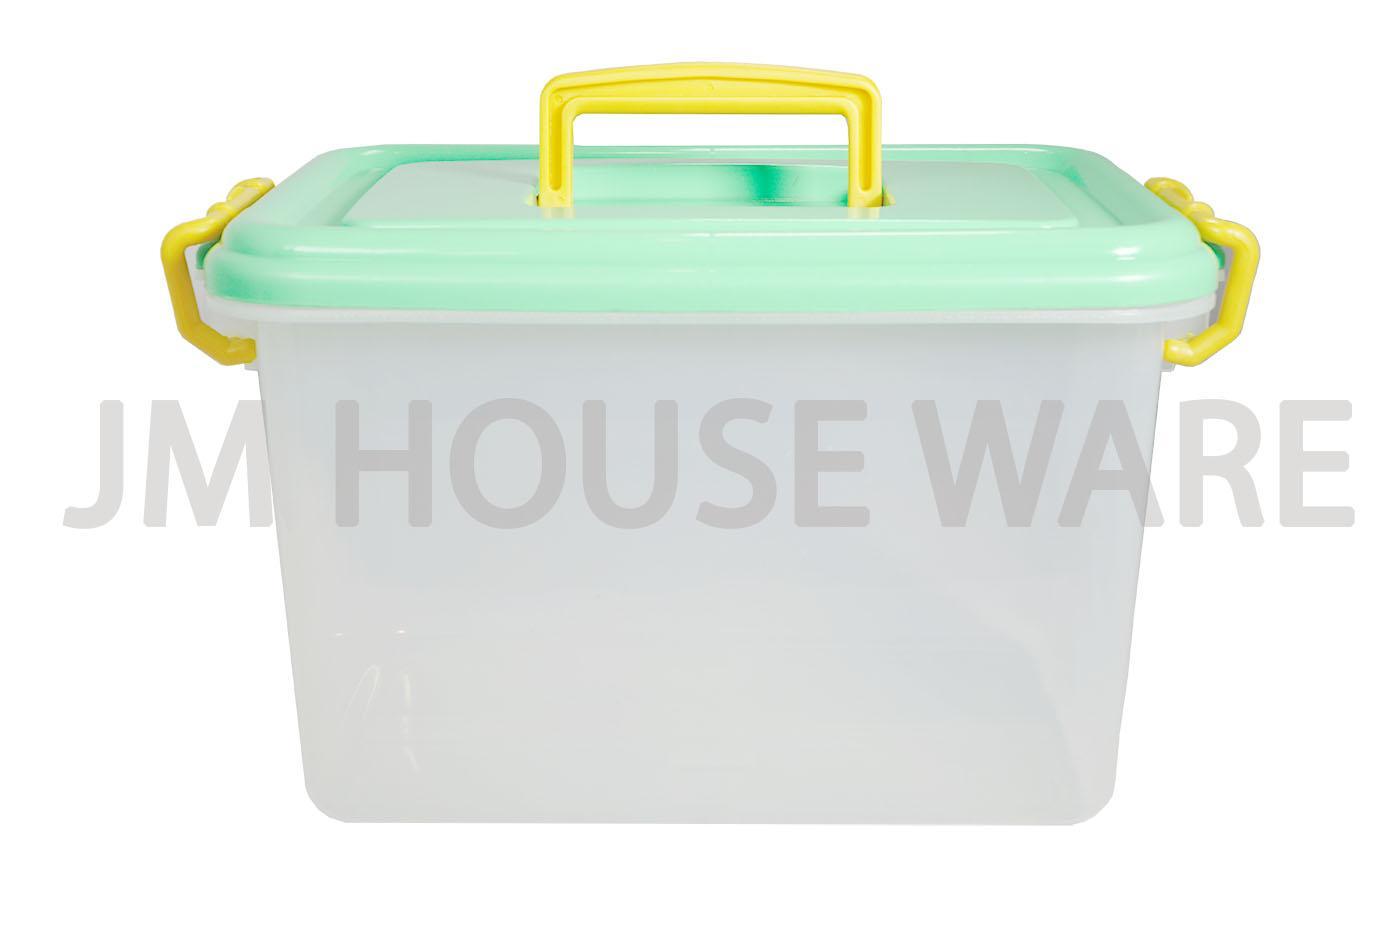 Jual Produk Shinpo Kotak Plastik Thermos Panas Clifia 1 L Lion Star Container Box Serbaguna Plastics Ukuran 15 Liter